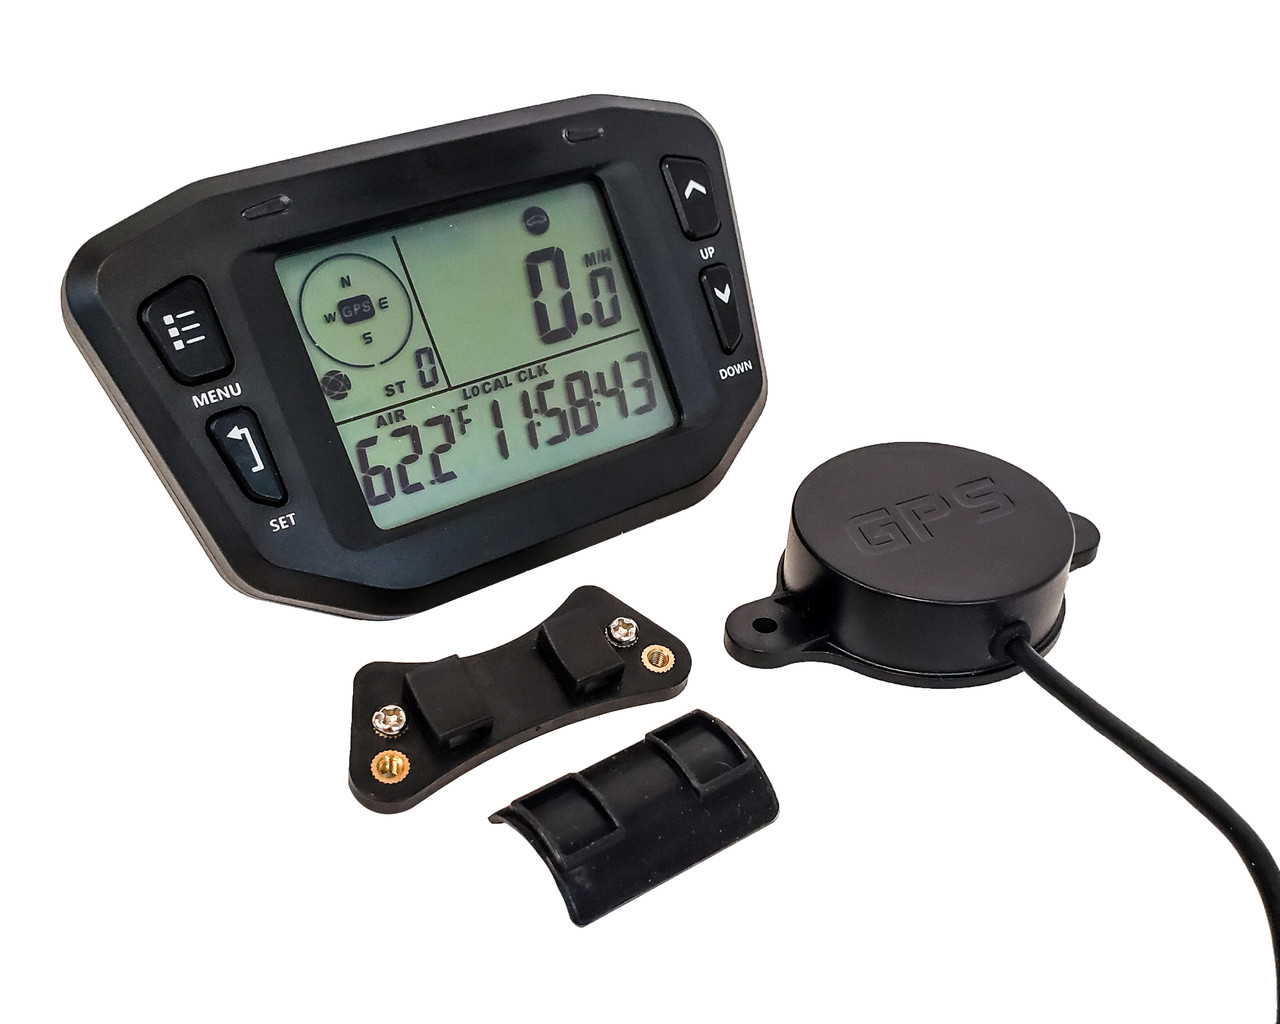 GPS Speedometer OZ-USA 60mm gauge odometer battery meter digital dash 12v 24v mph kmh car truck boat marine motorcycle cart atv glider